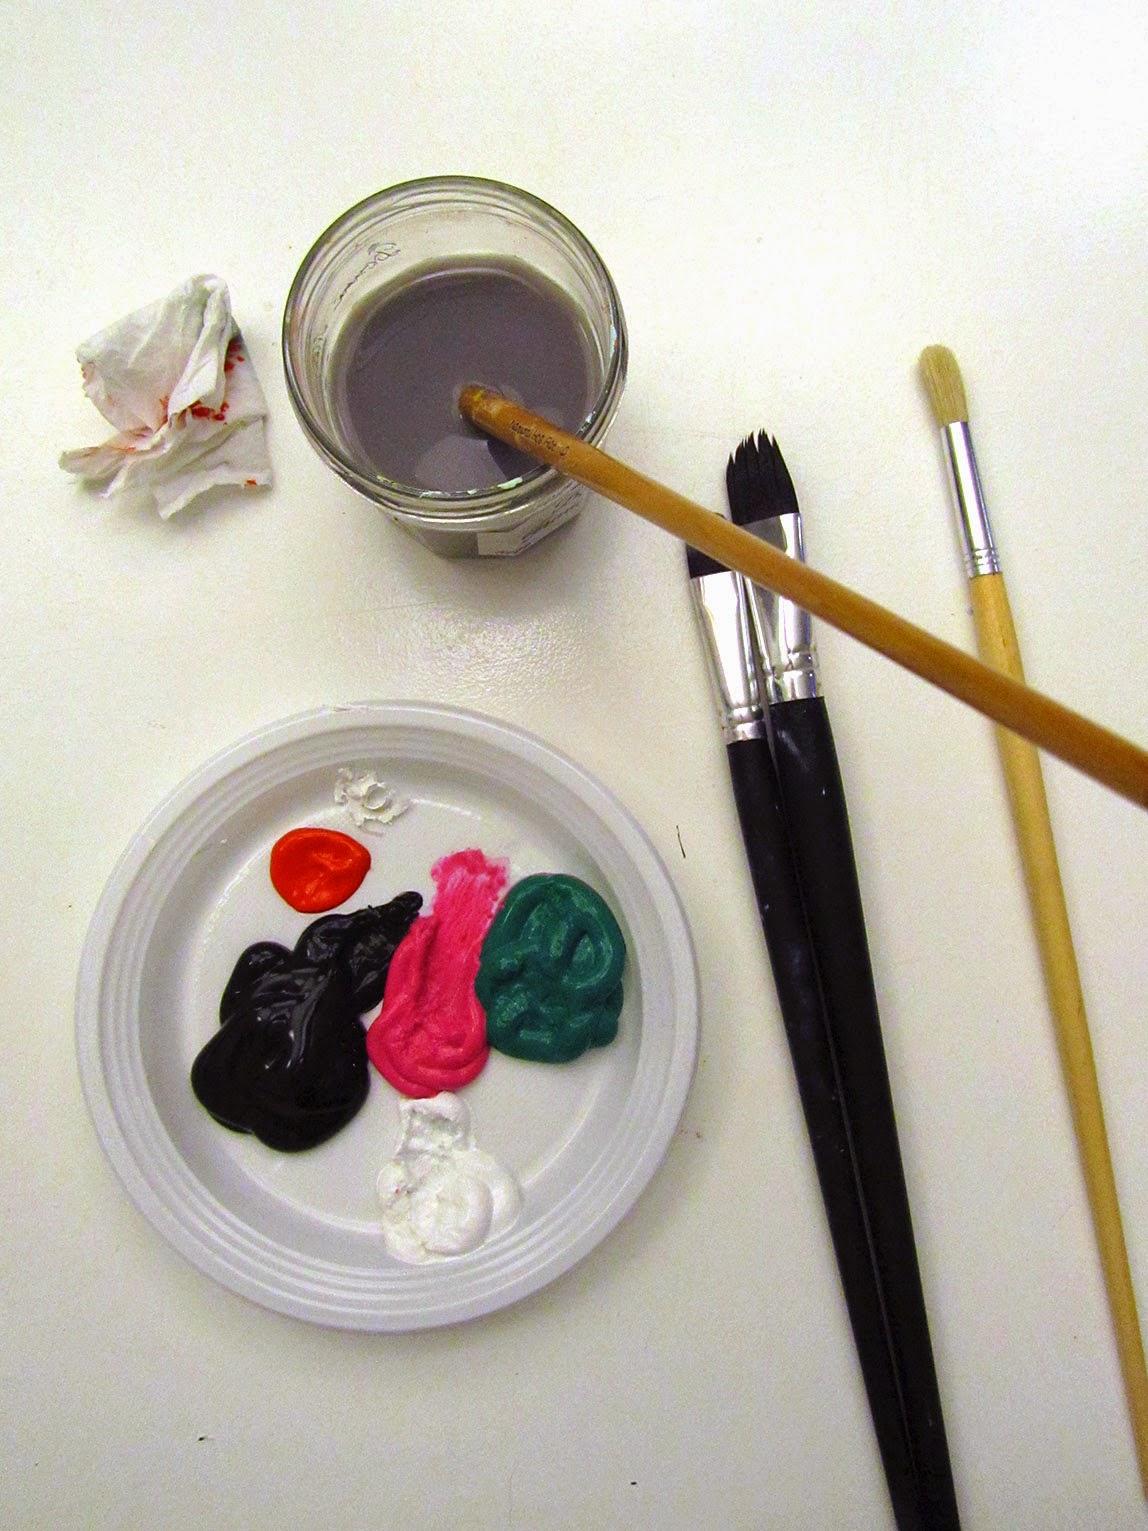 painting utensils